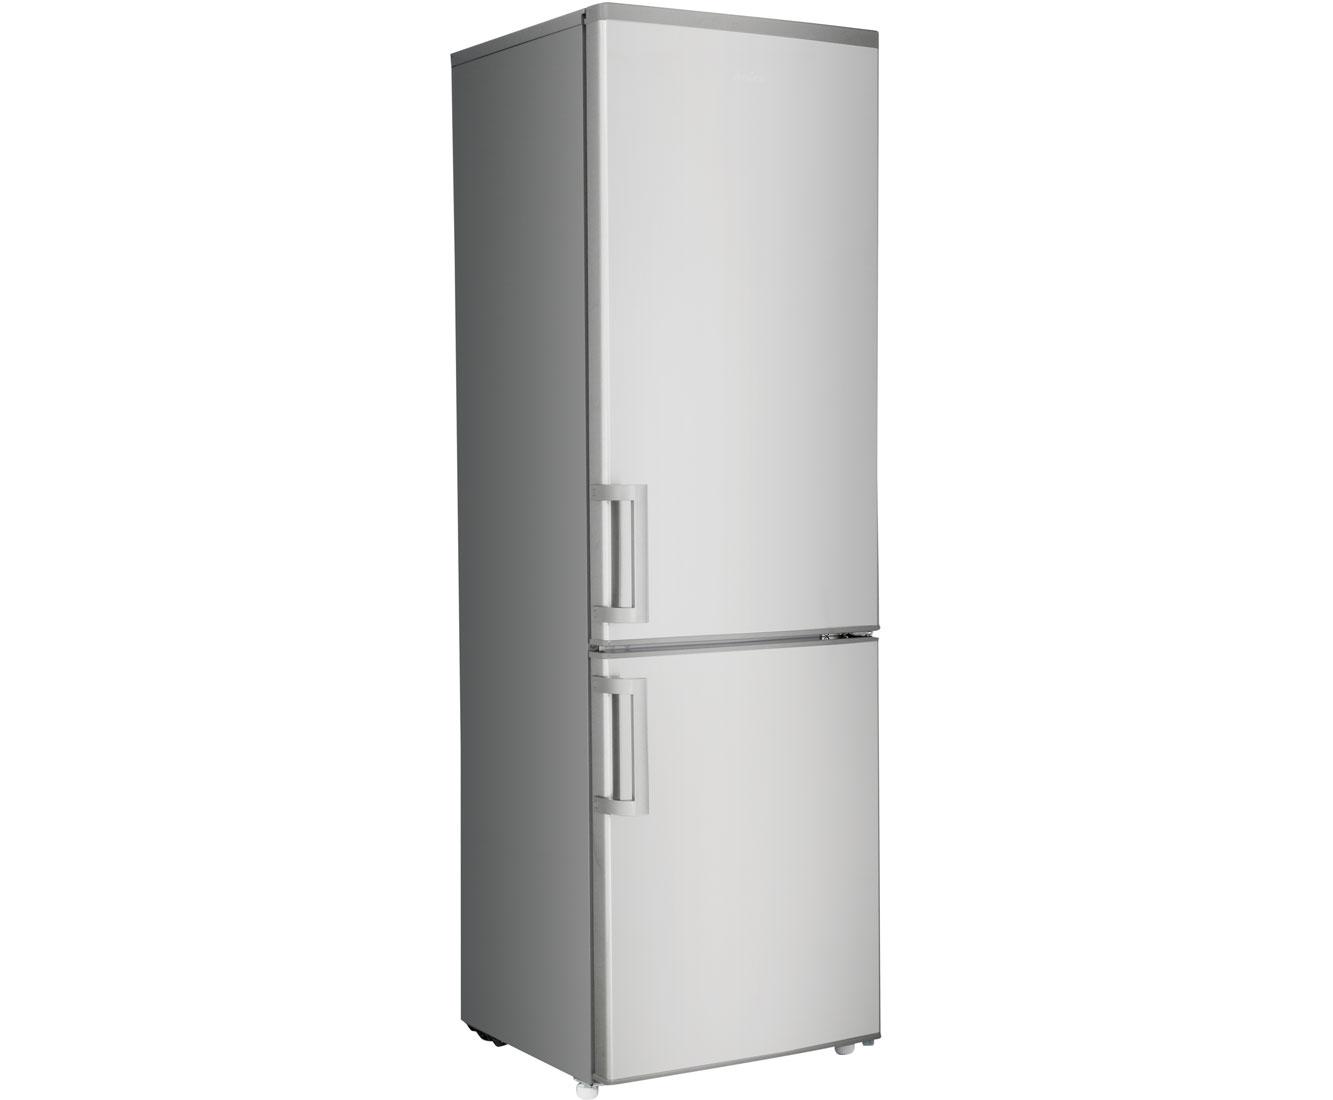 Amica Kühlschrank Probleme : Amica kgc e kühl gefrierkombination er breite edelstahl